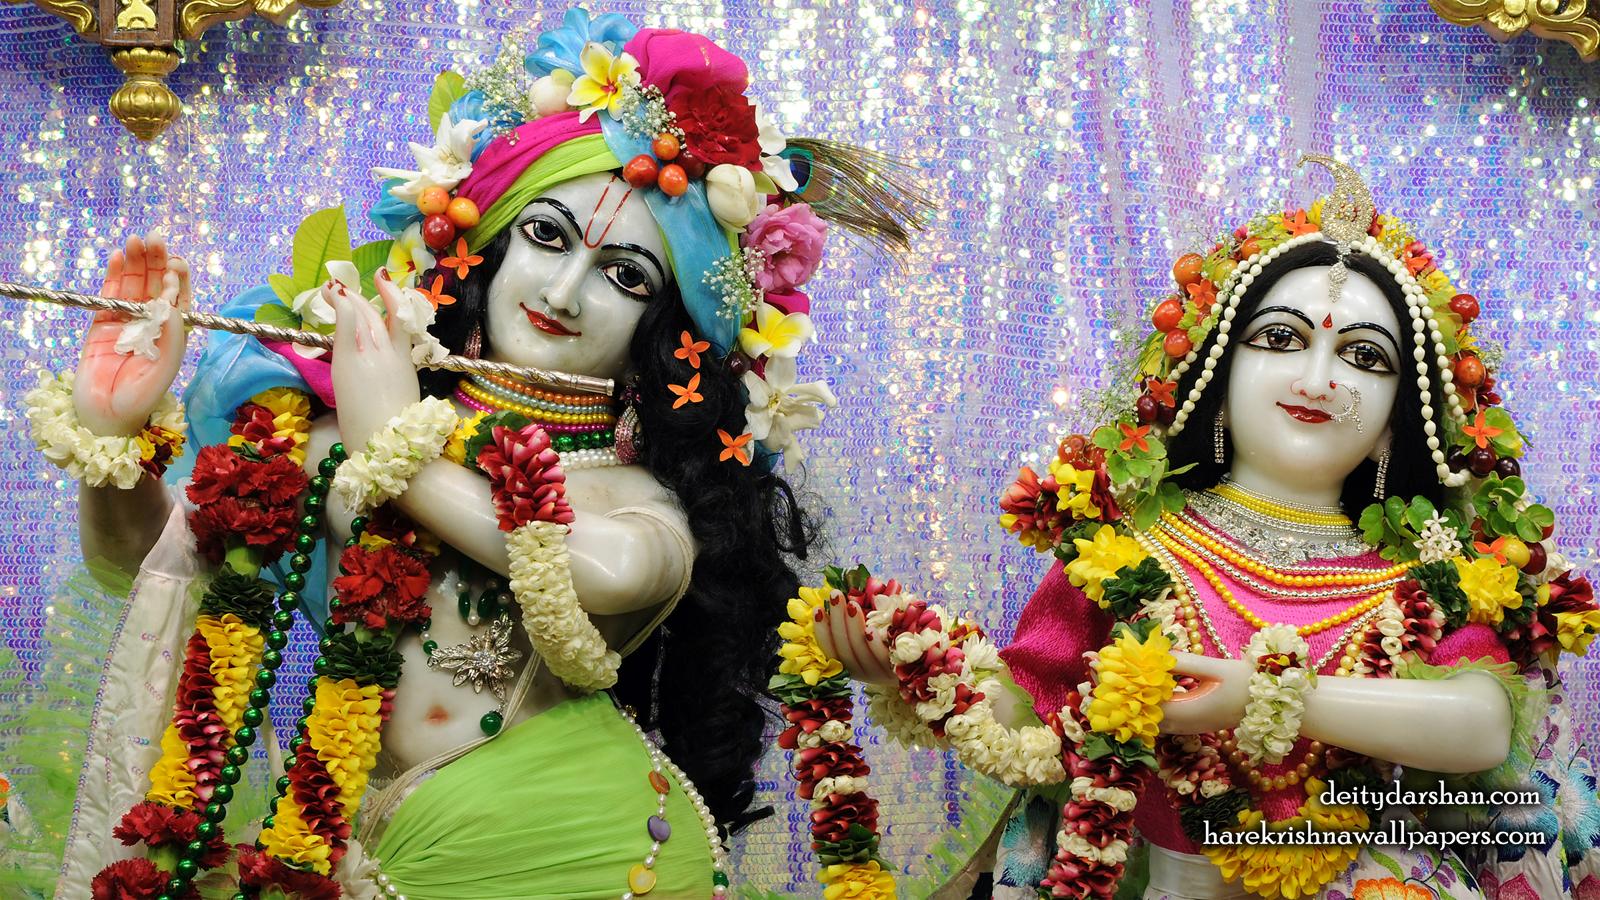 Sri Sri Radha Gopinath Close up Wallpaper (068) Size 1600x900 Download